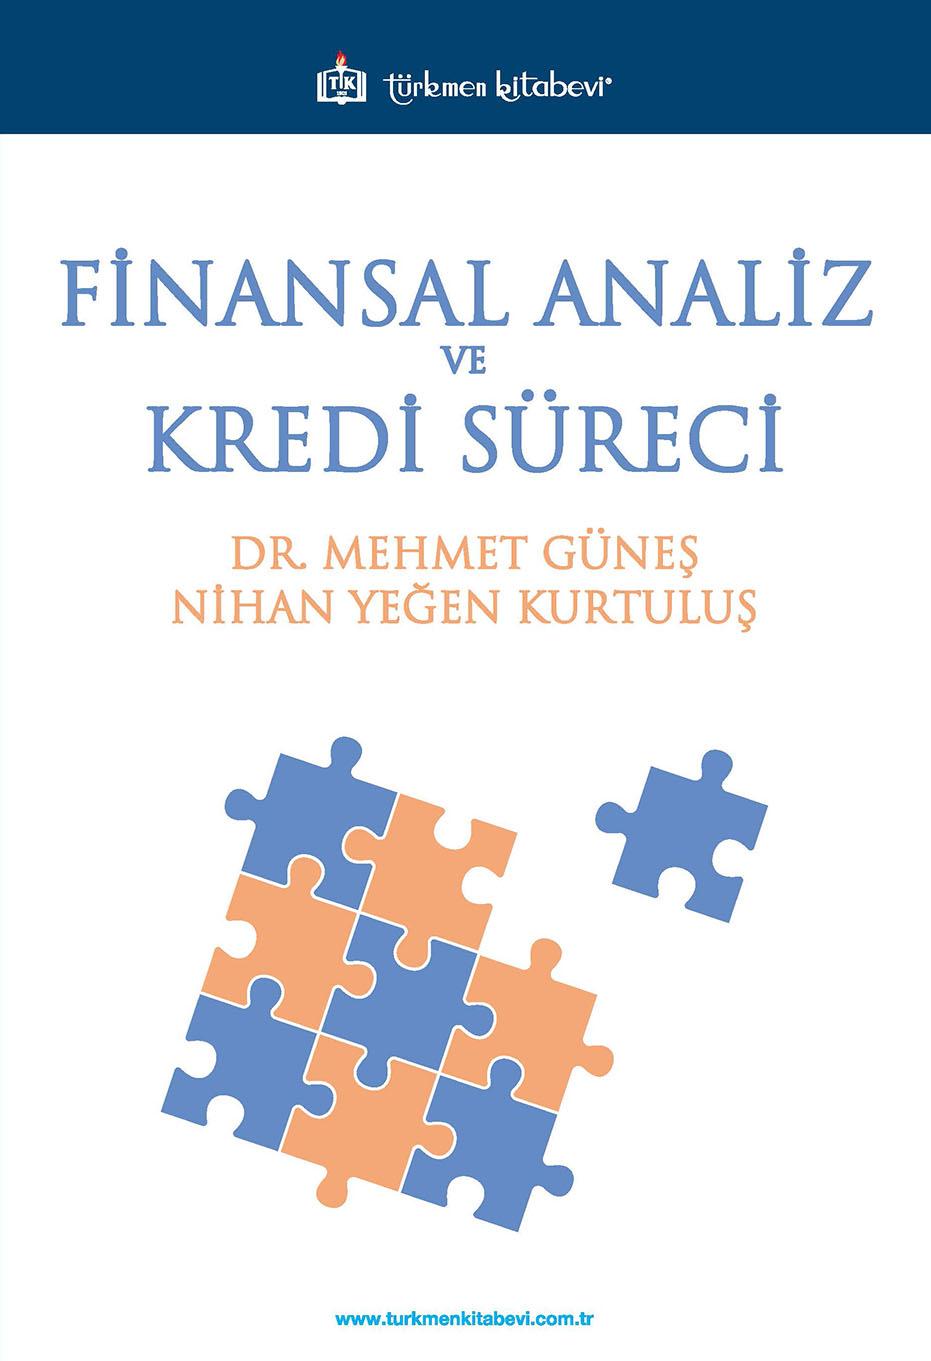 Finansal Analiz ve Kredi Süreci